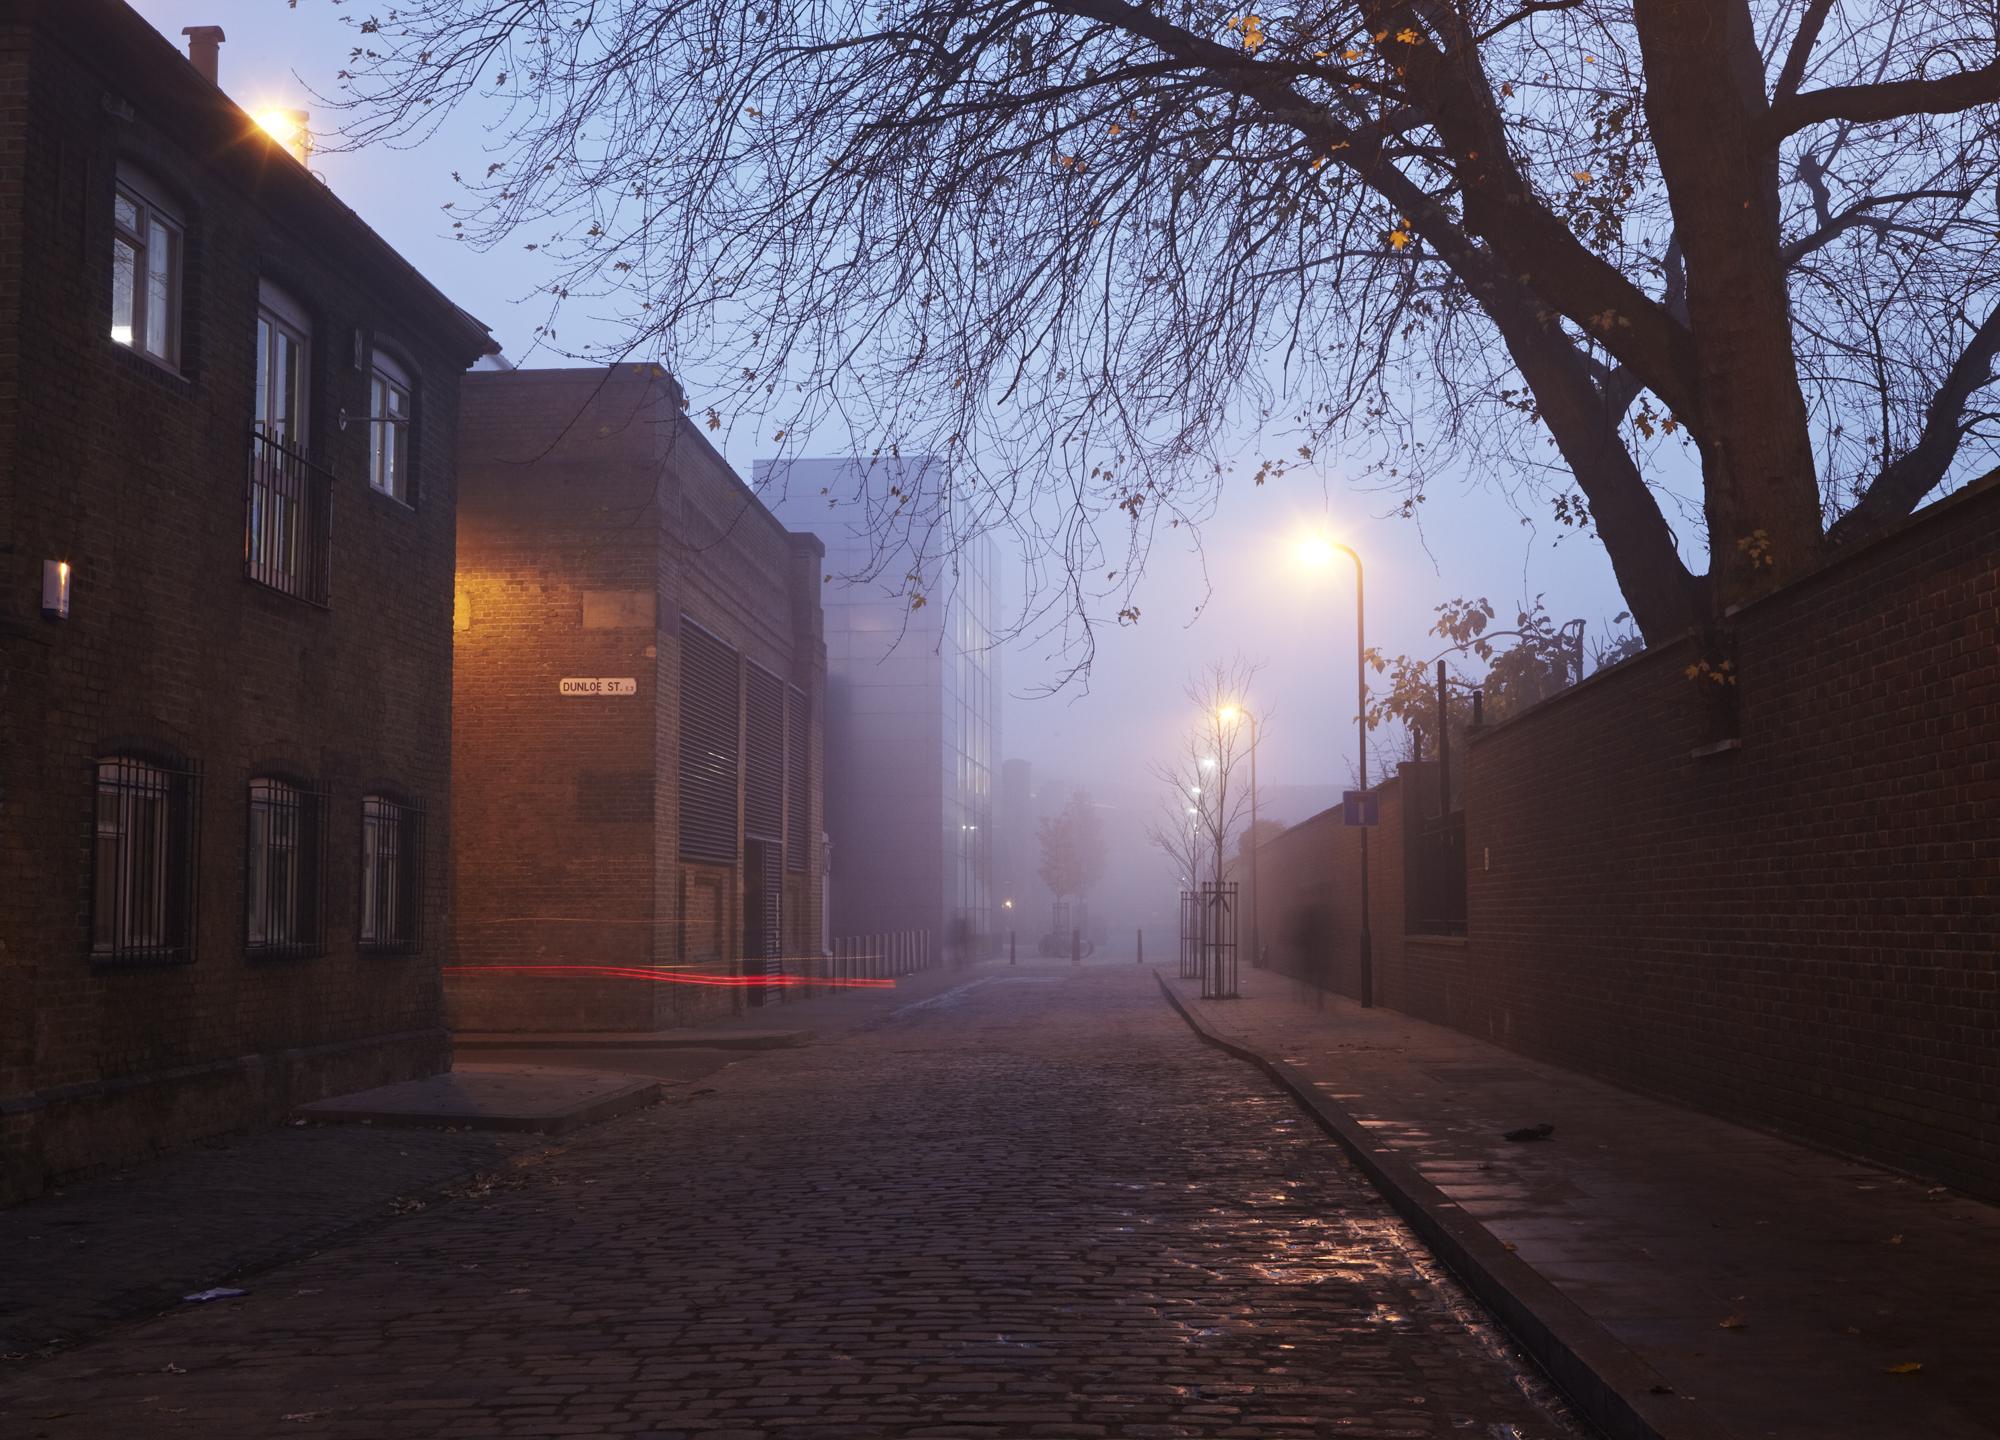 Grant Smith - Shoredich, cobbled street